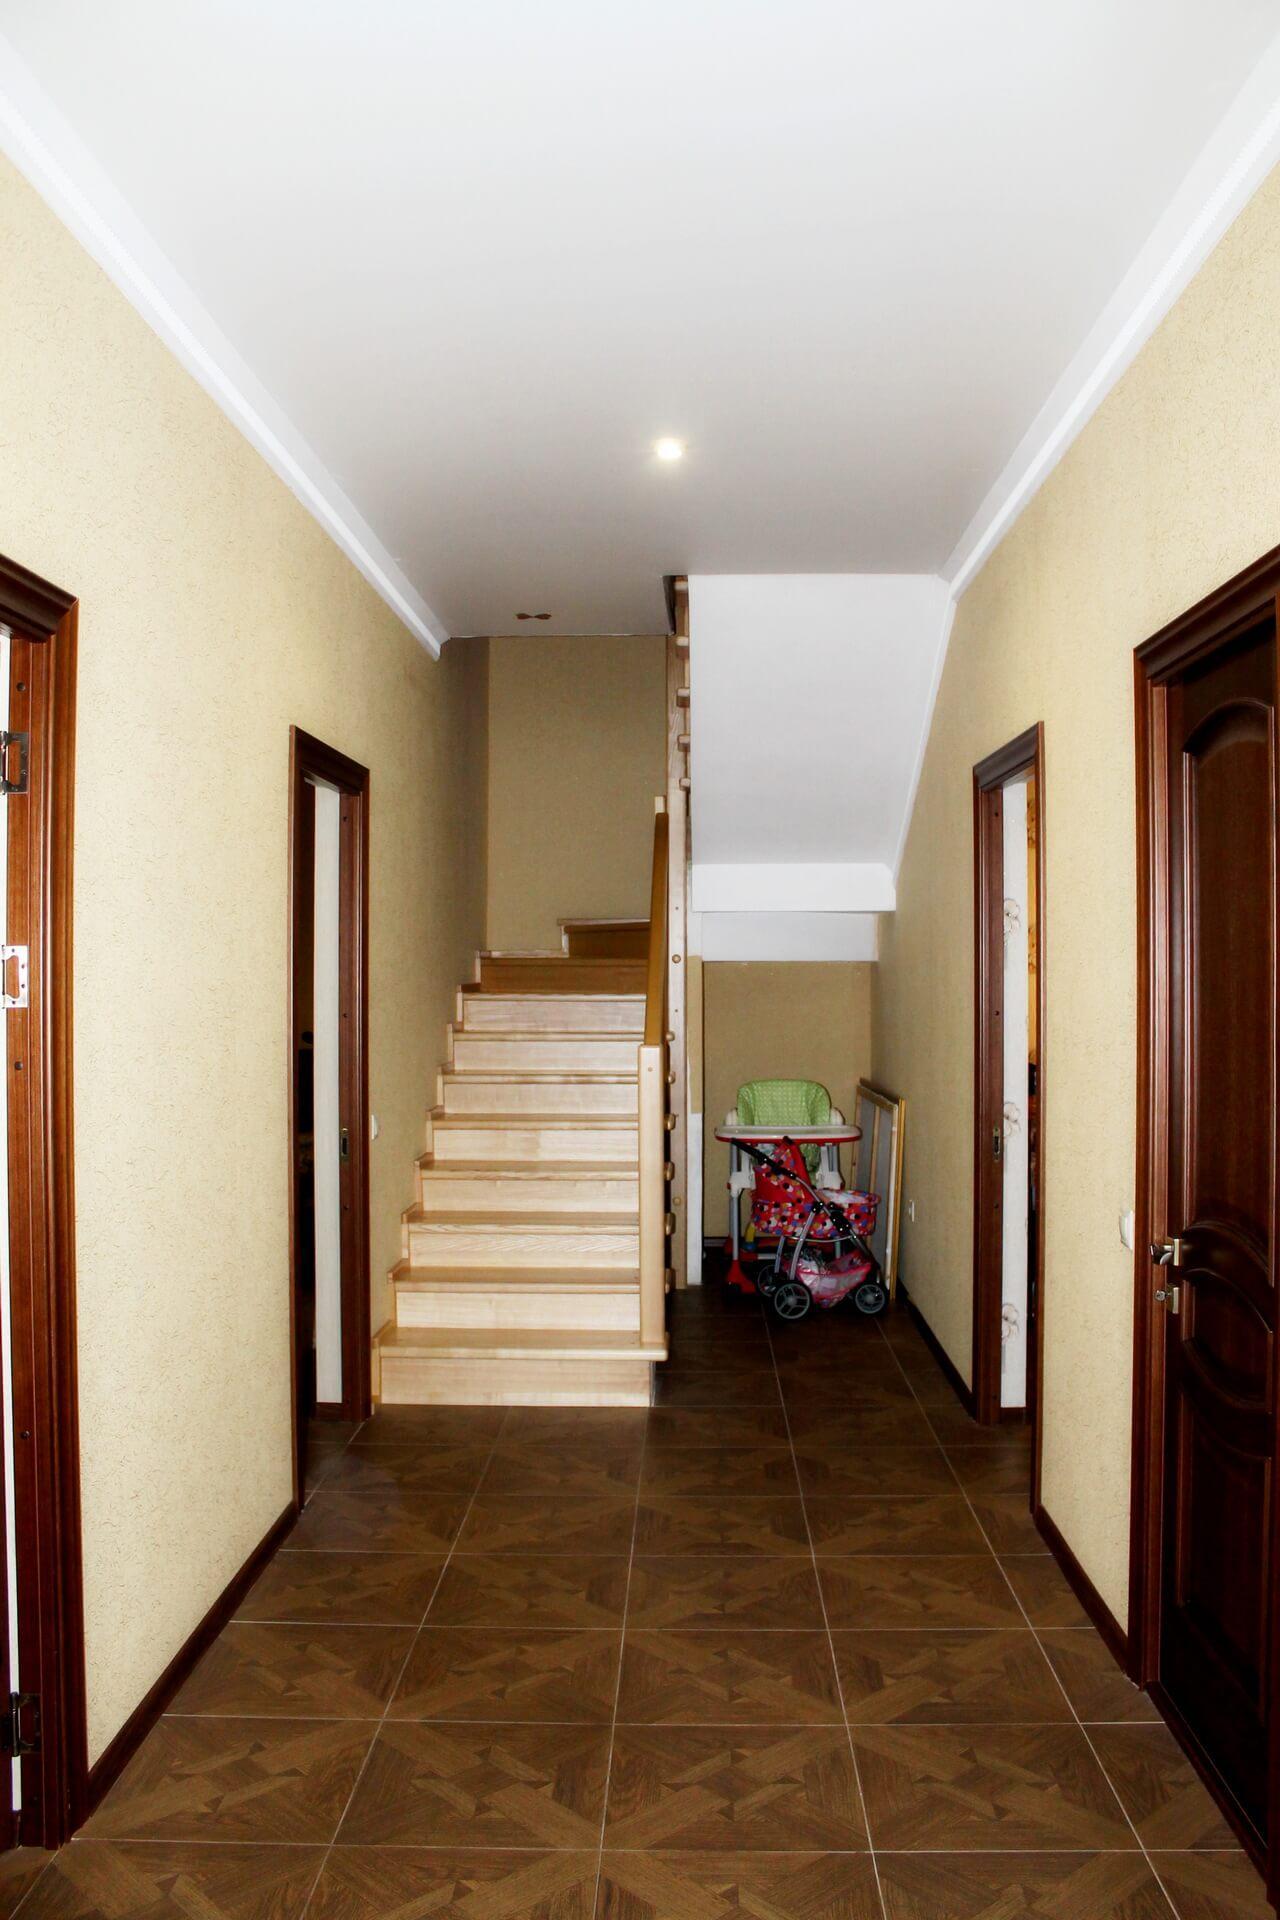 Гостевой дом на улице Веселая - image Gostevoj-dom-v-Adlere-11 on http://bizneskvartal.ru